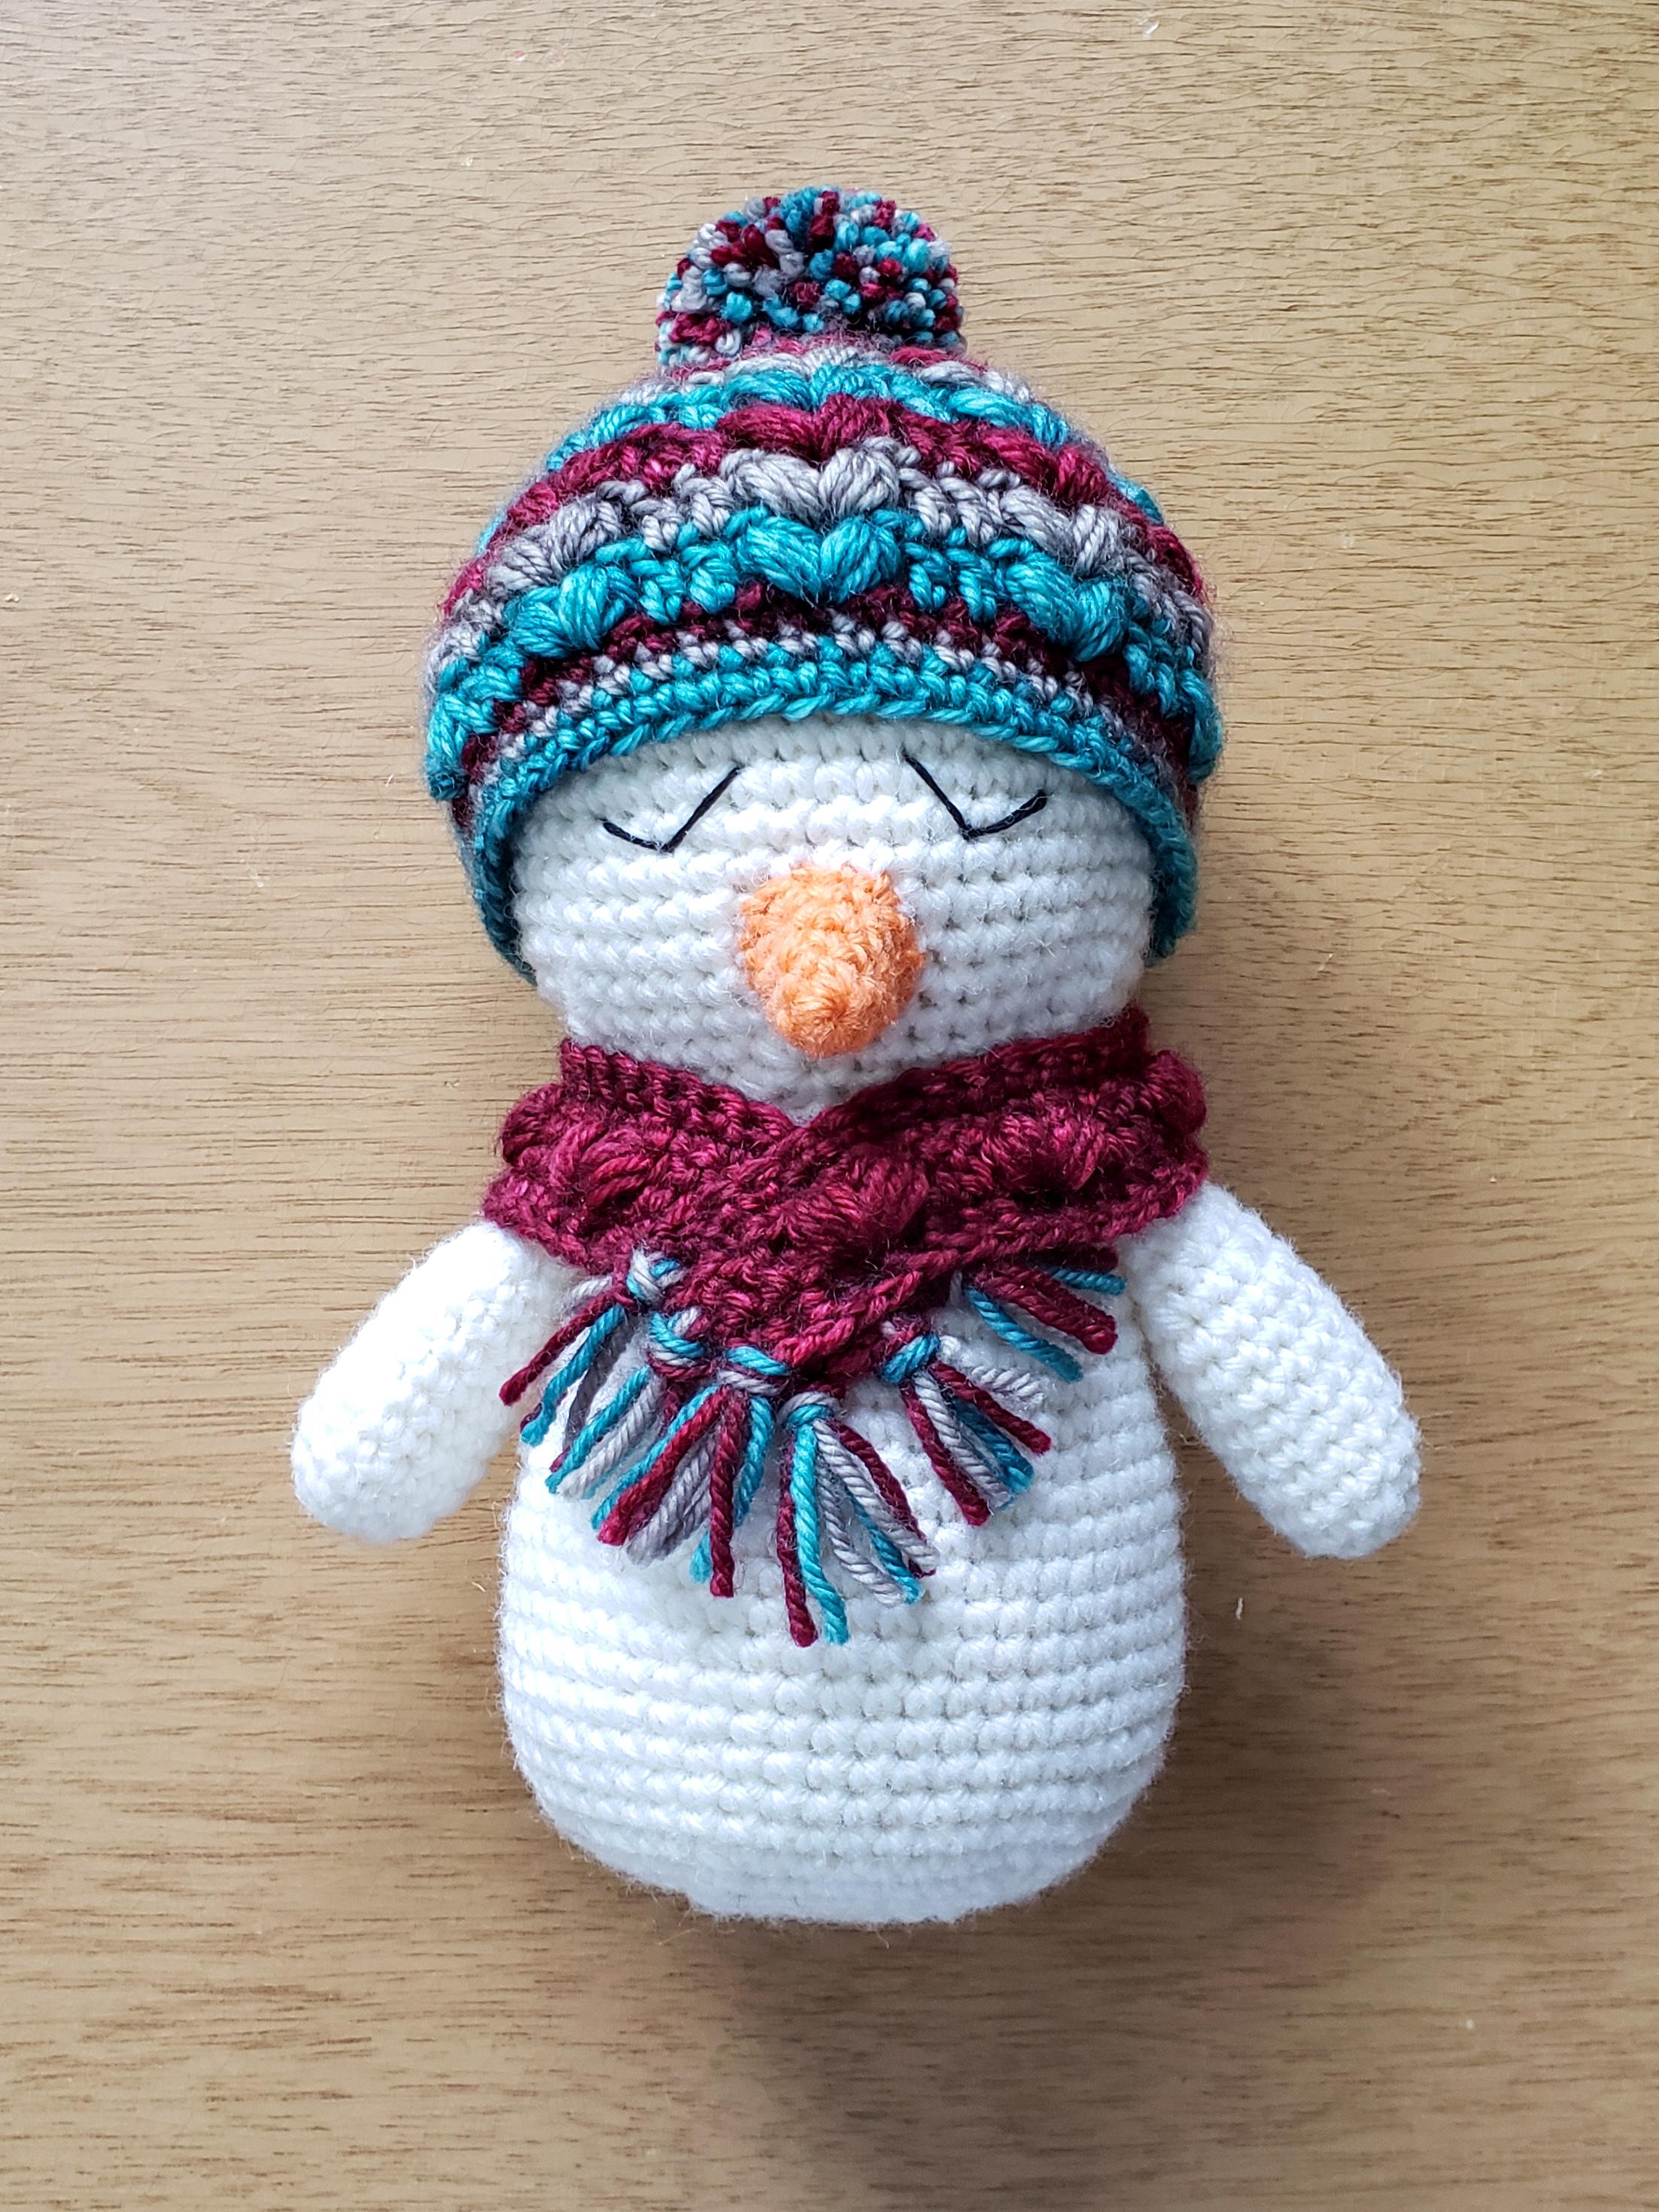 Ravelry: Winter Bunny pattern by Sharon Ojala | 2940x2205